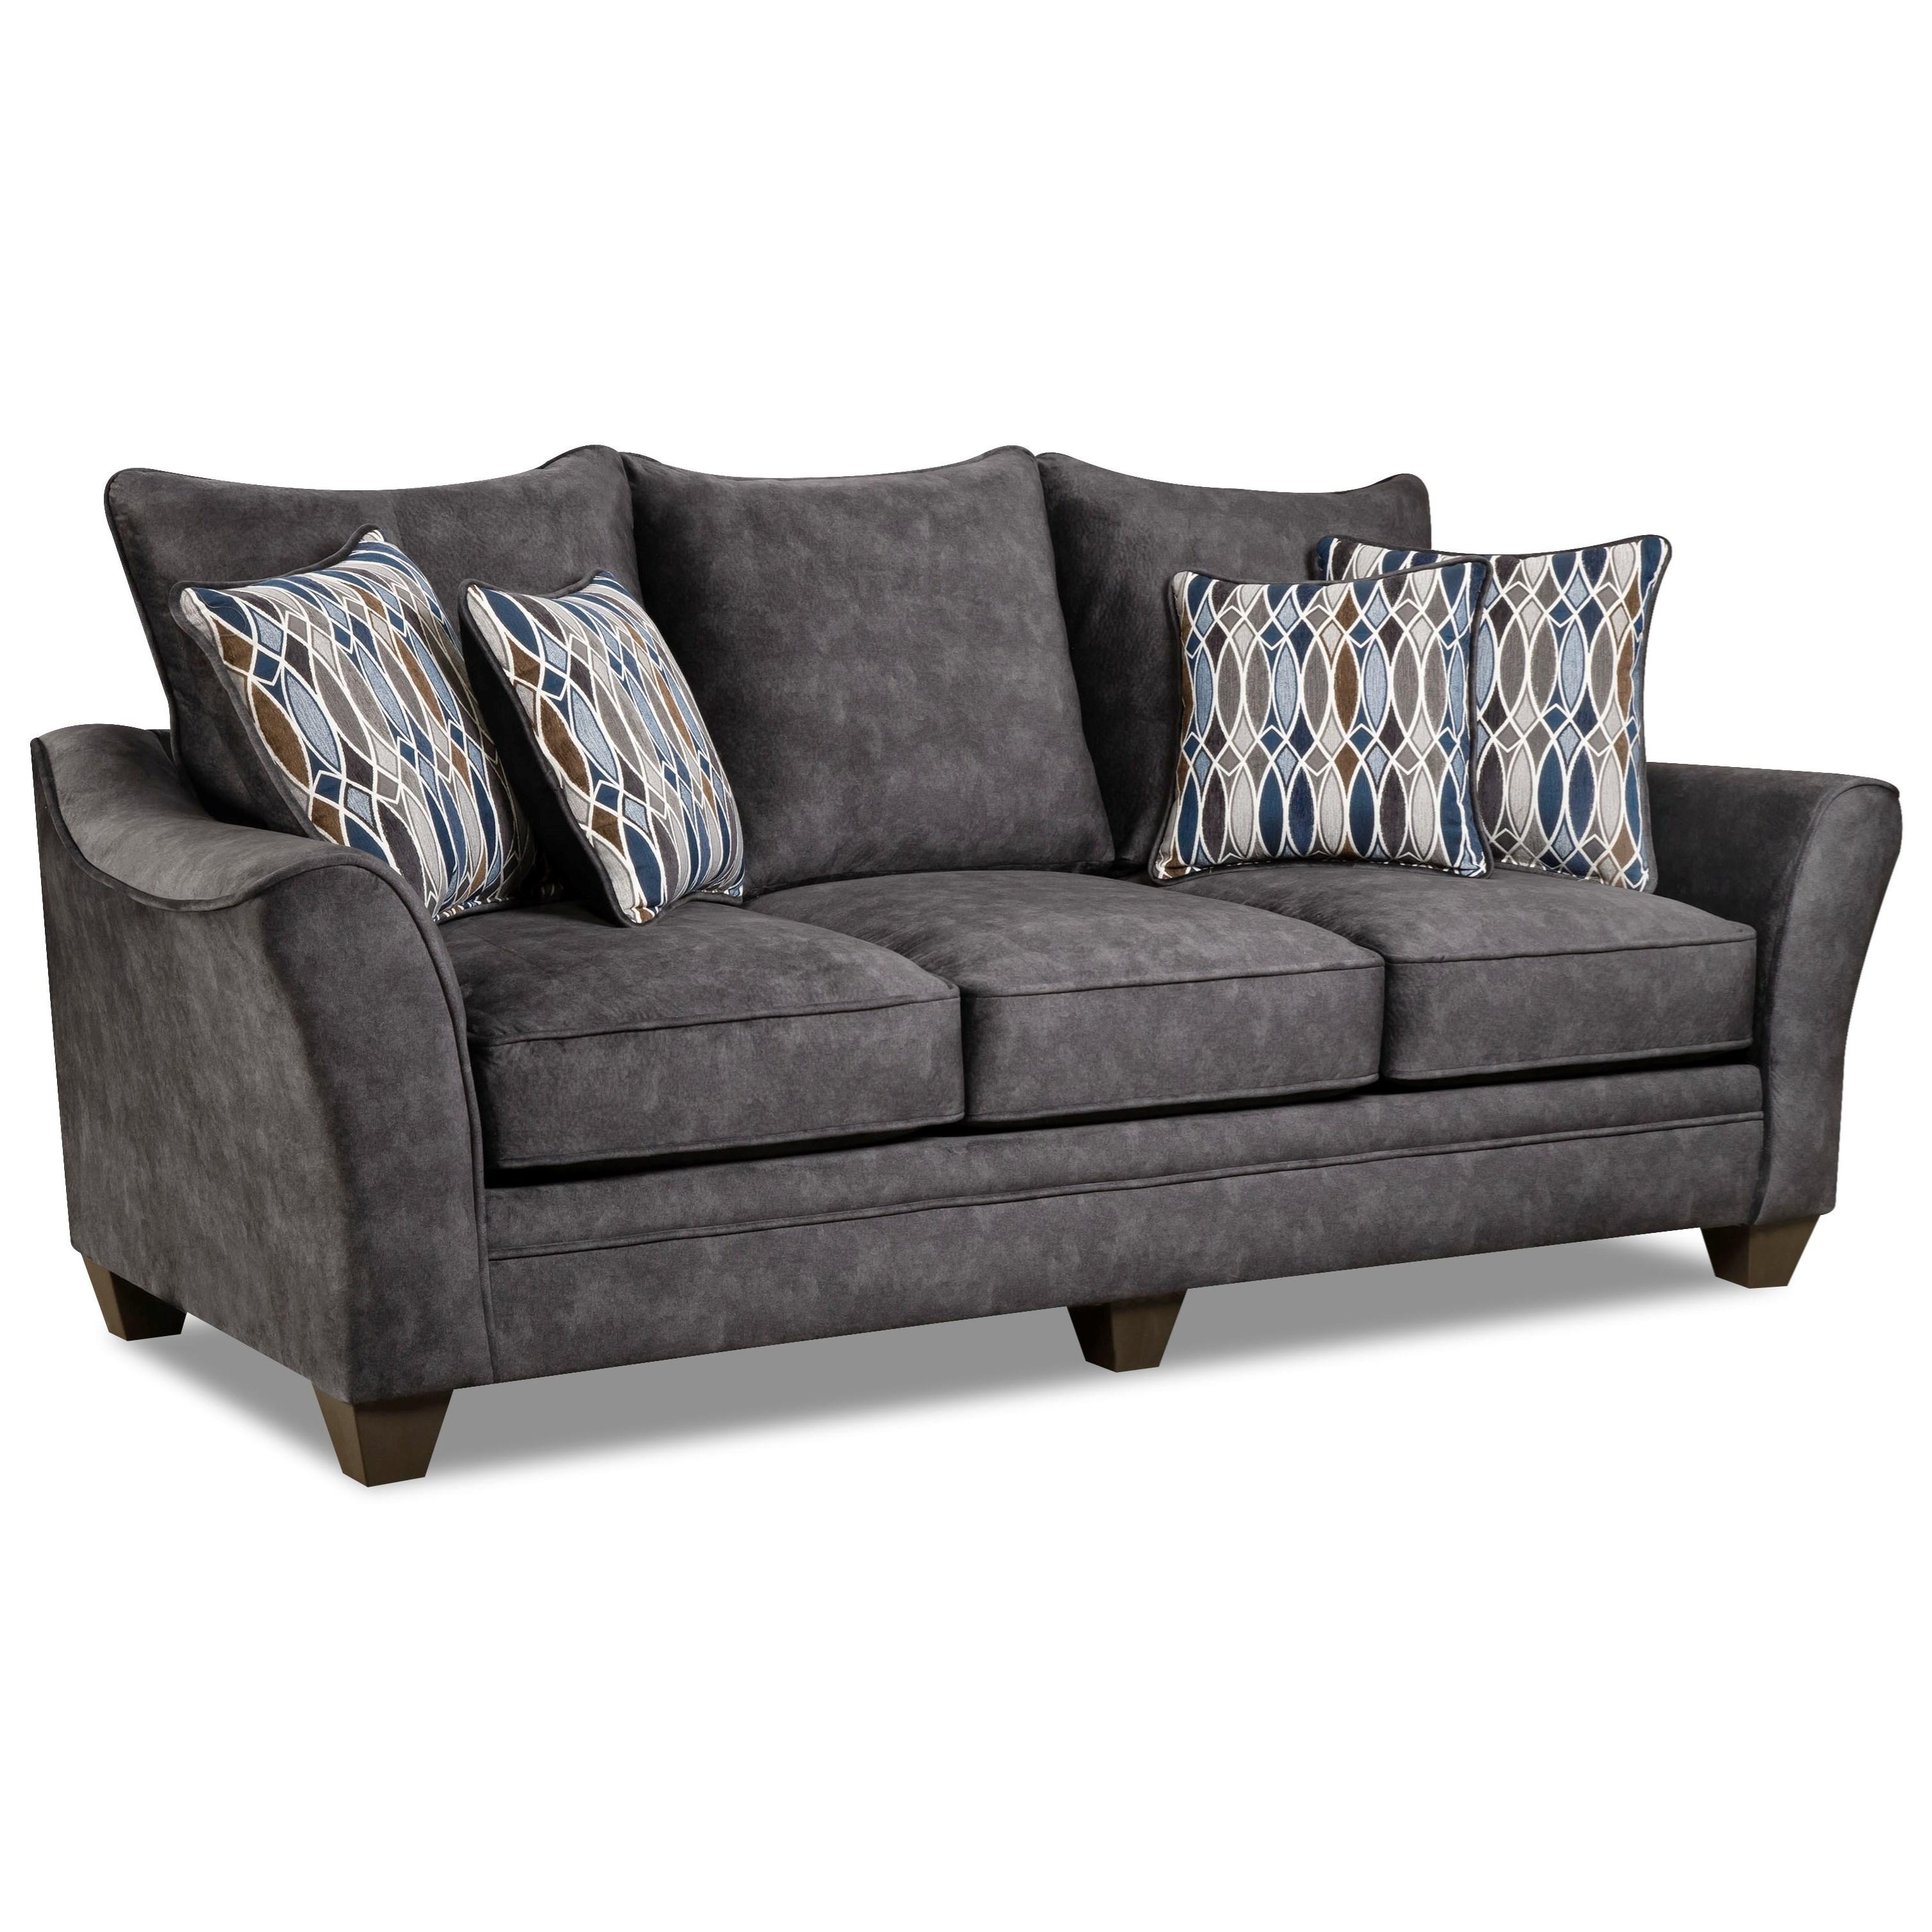 3850 Sofa by Peak Living at Wayside Furniture